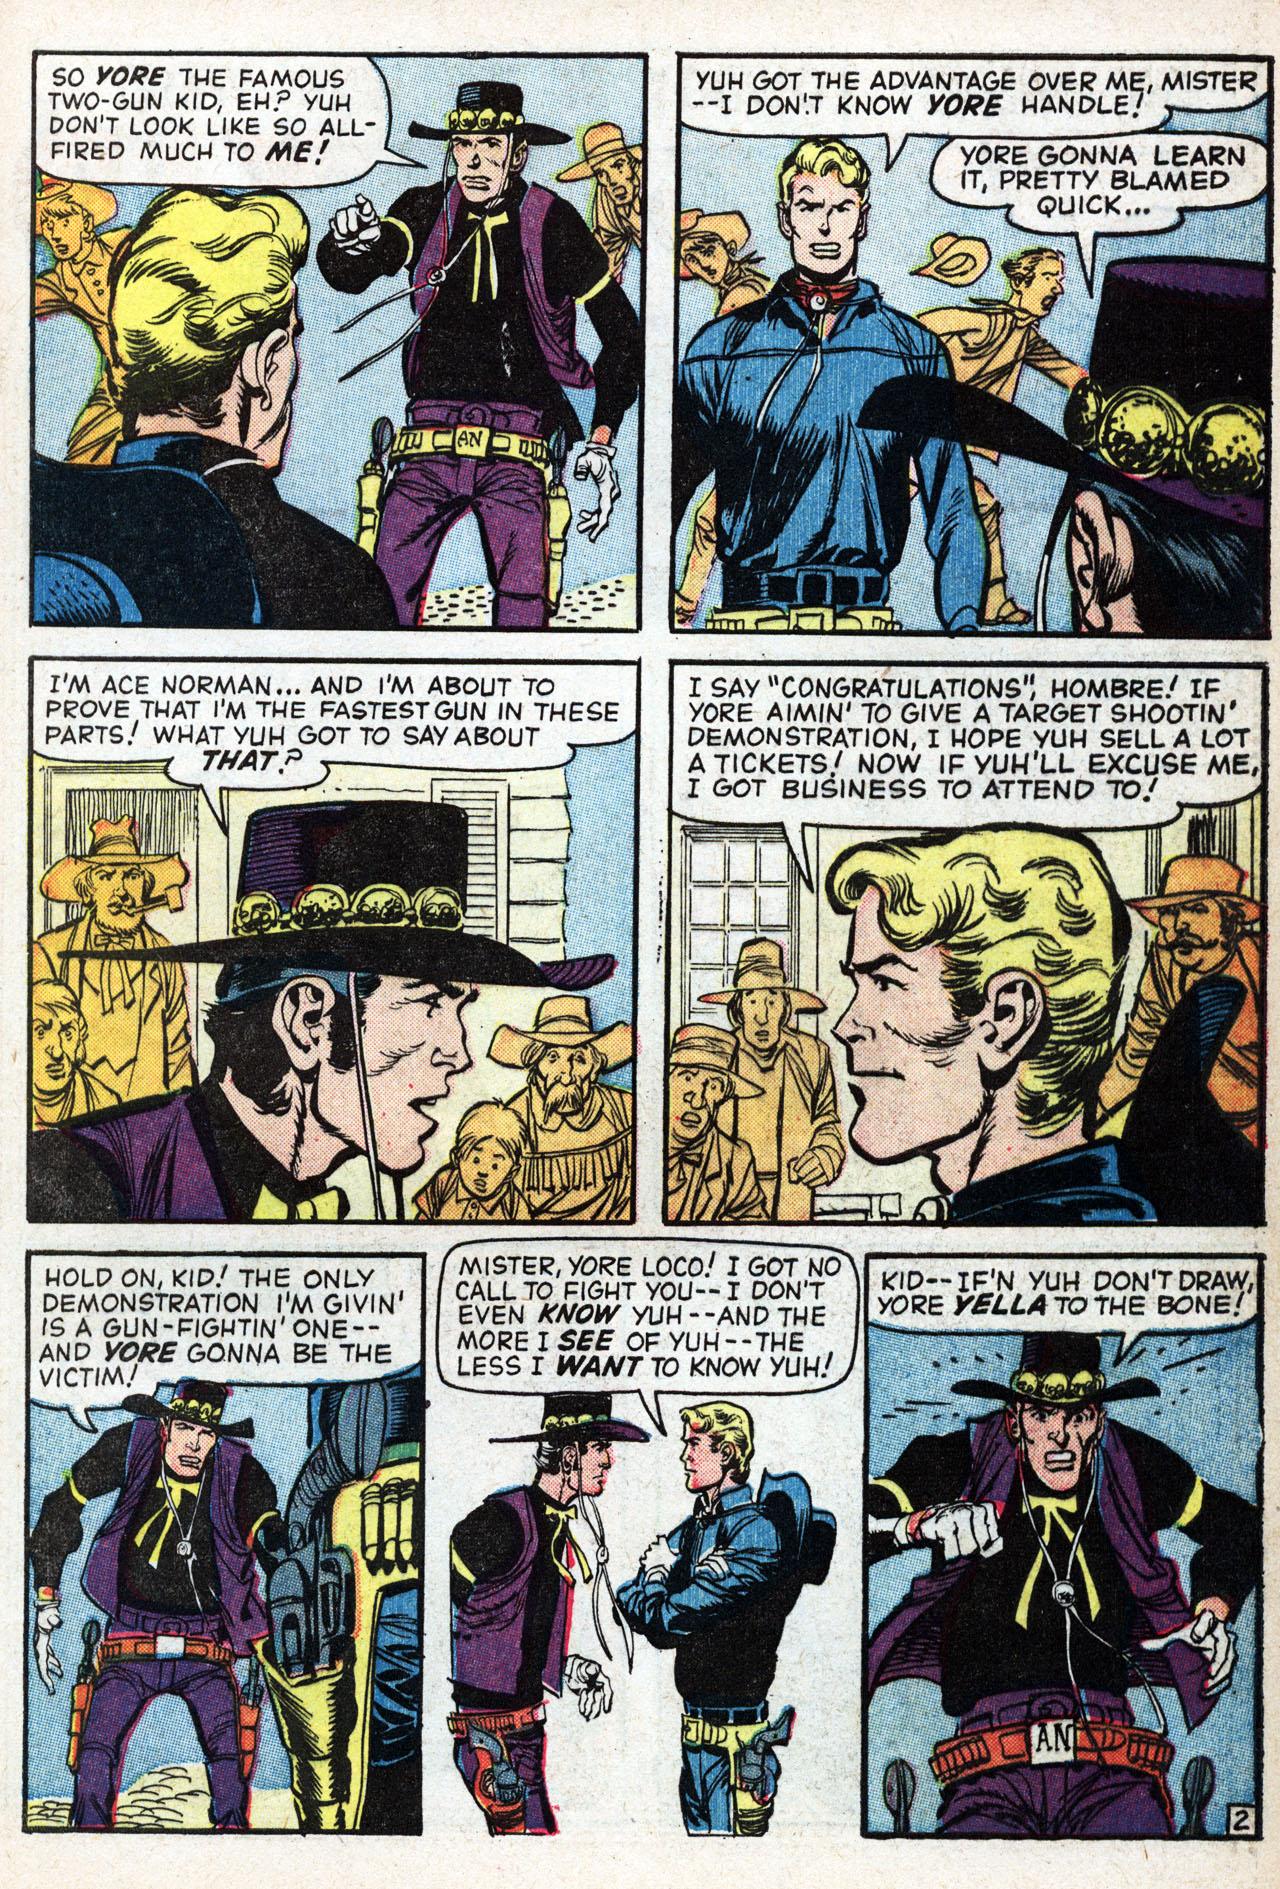 Read online Two-Gun Kid comic -  Issue #46 - 29